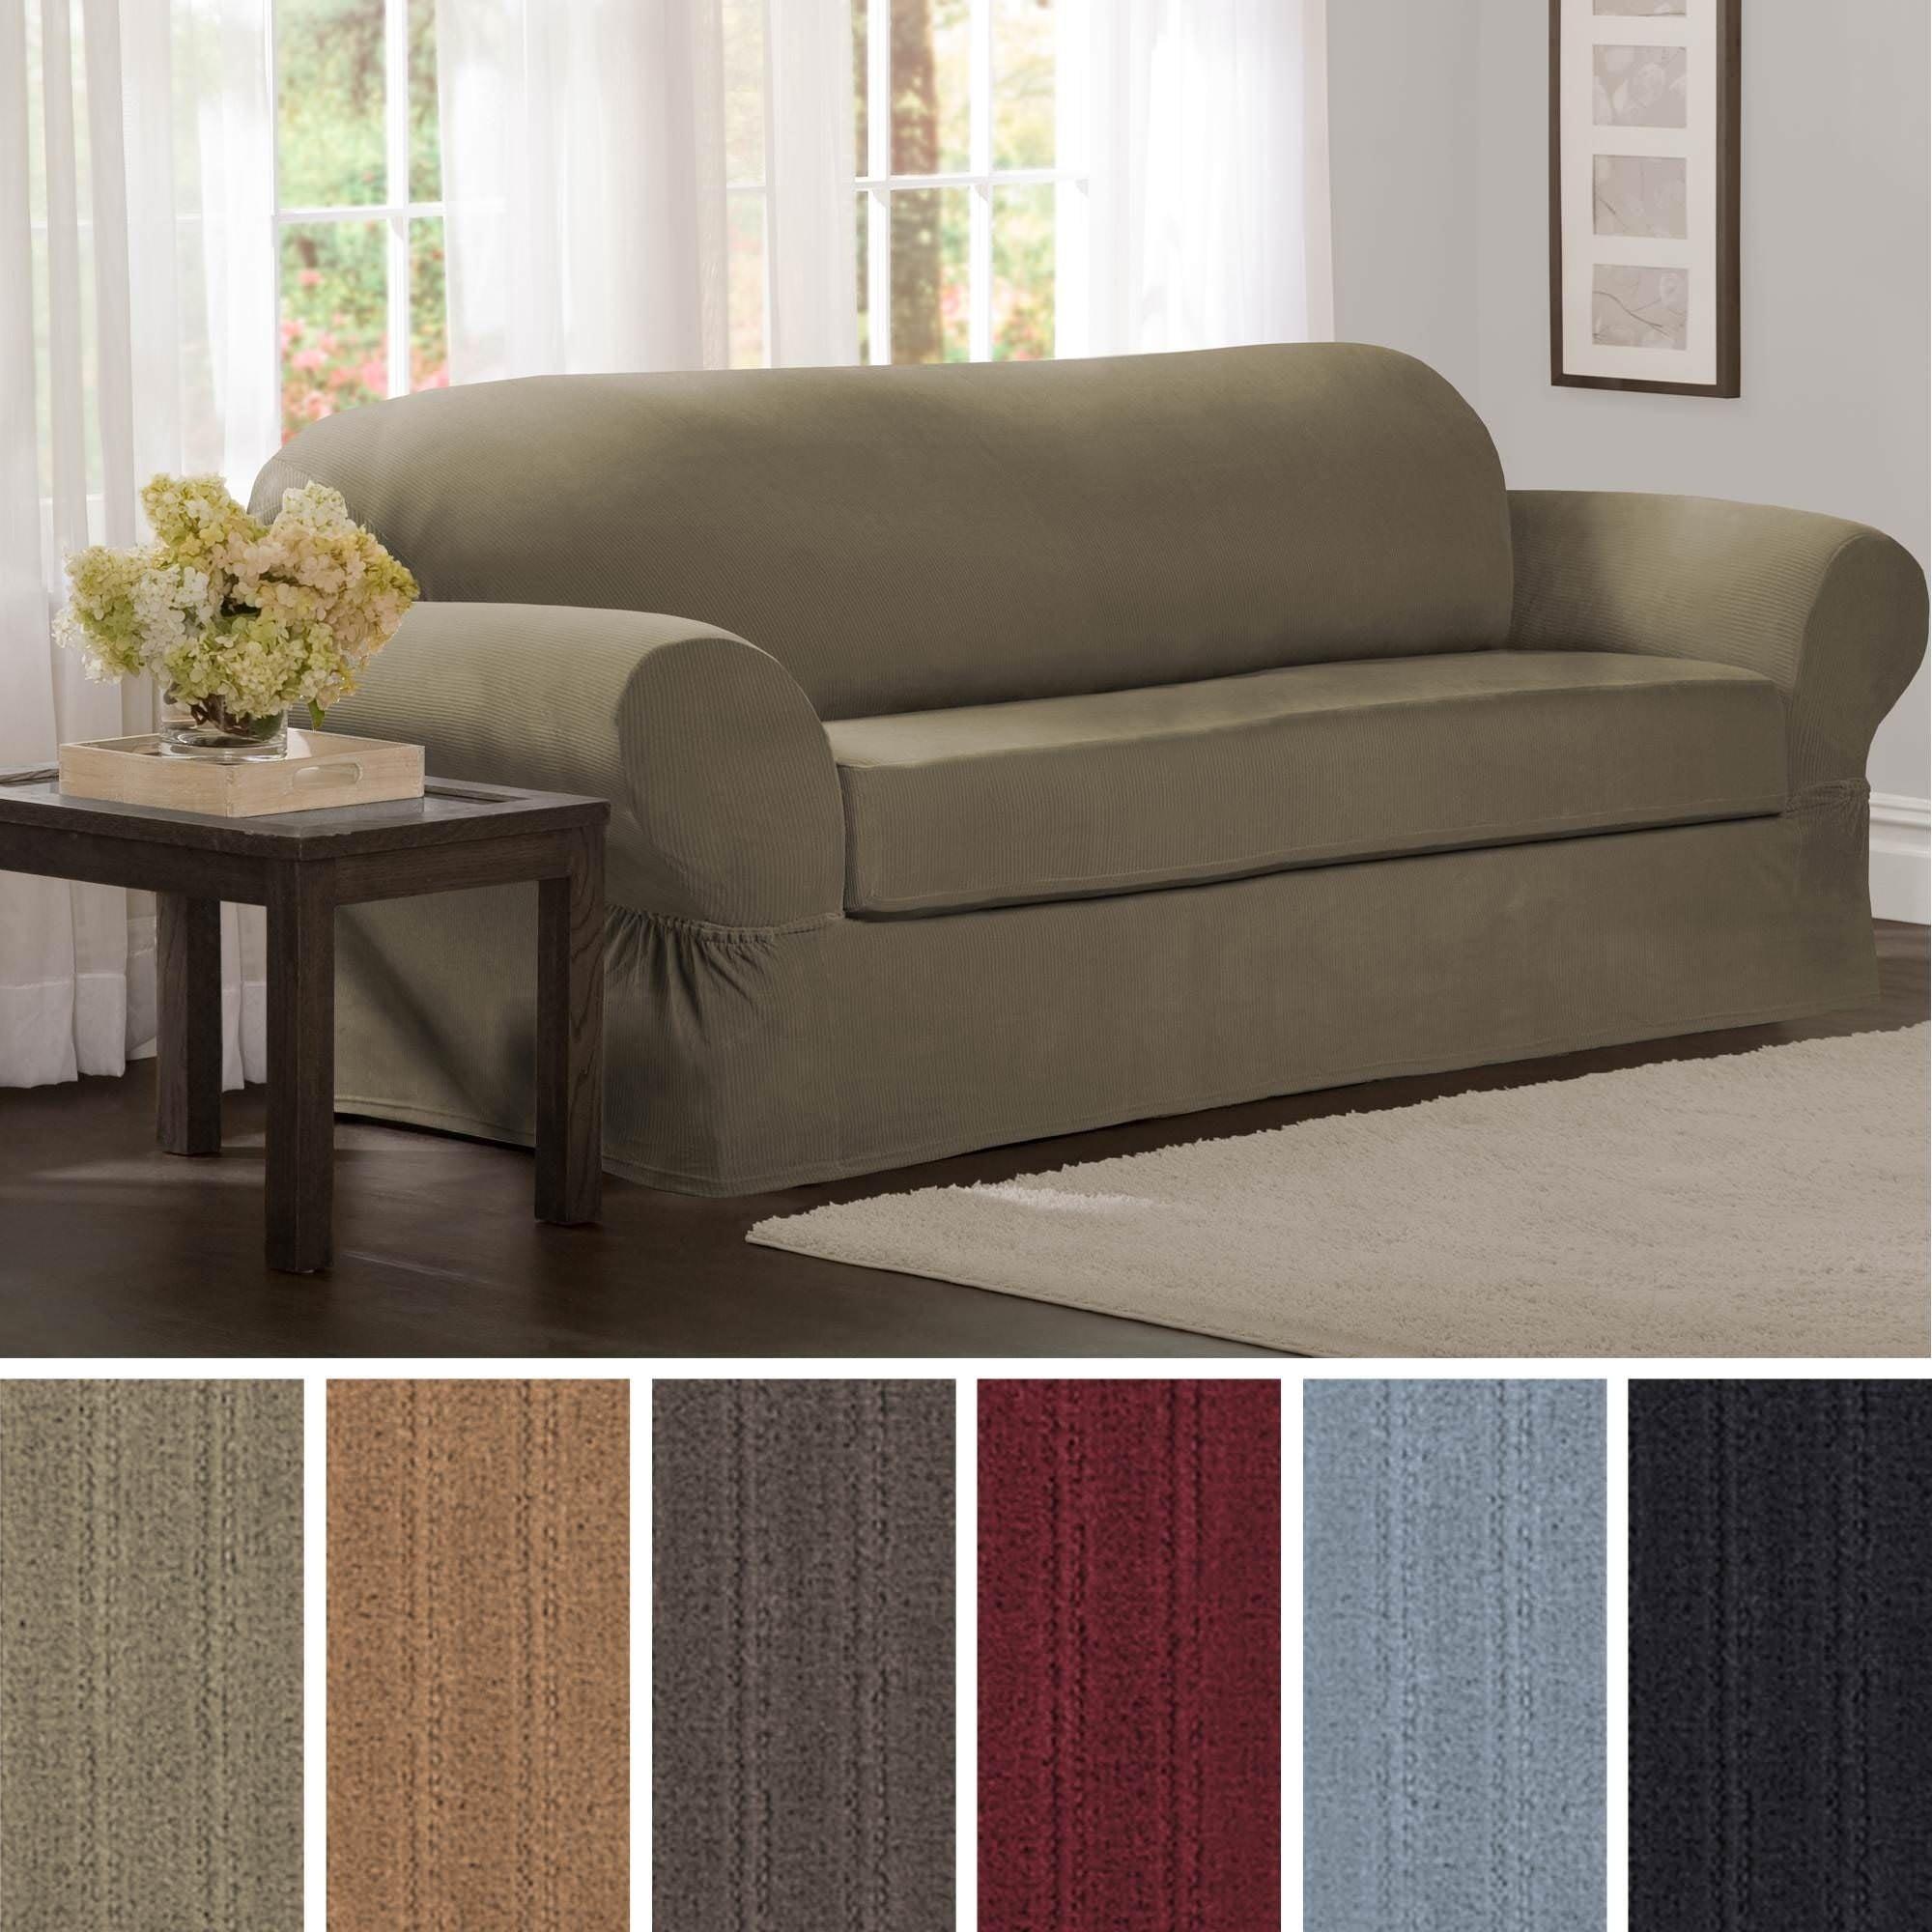 Shop Maytex Collin 2 Piece Sofa Slipcover 74 96 Wide 34 High 38